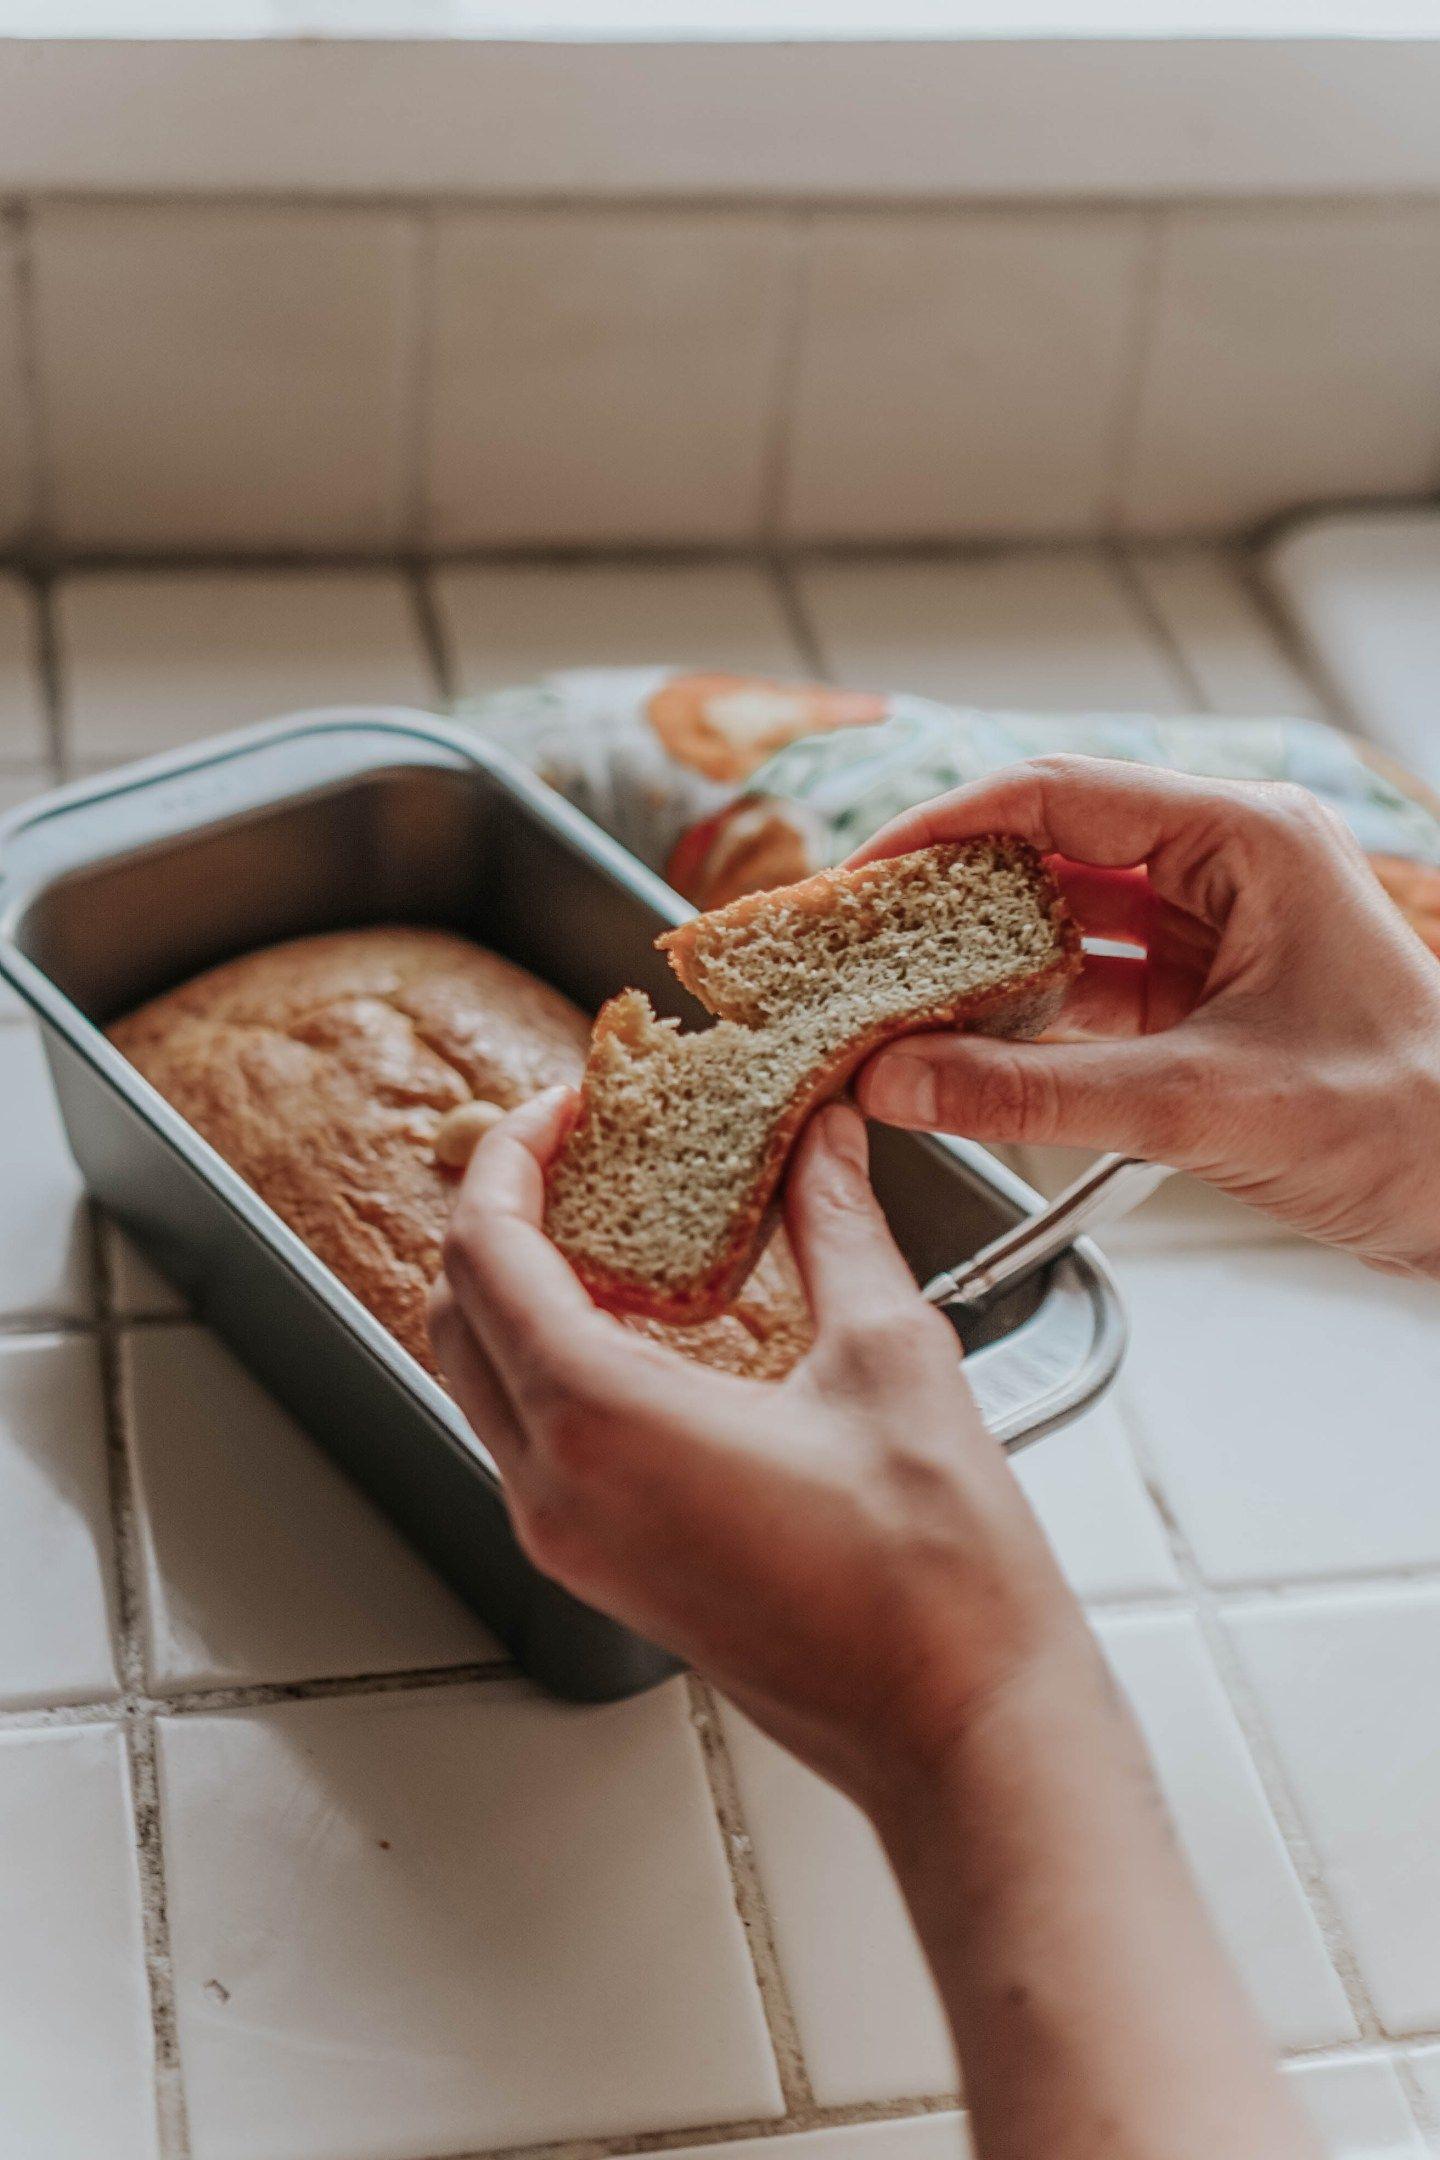 Keto Bread Whole Foods  Keto Macadamia Nut Bread